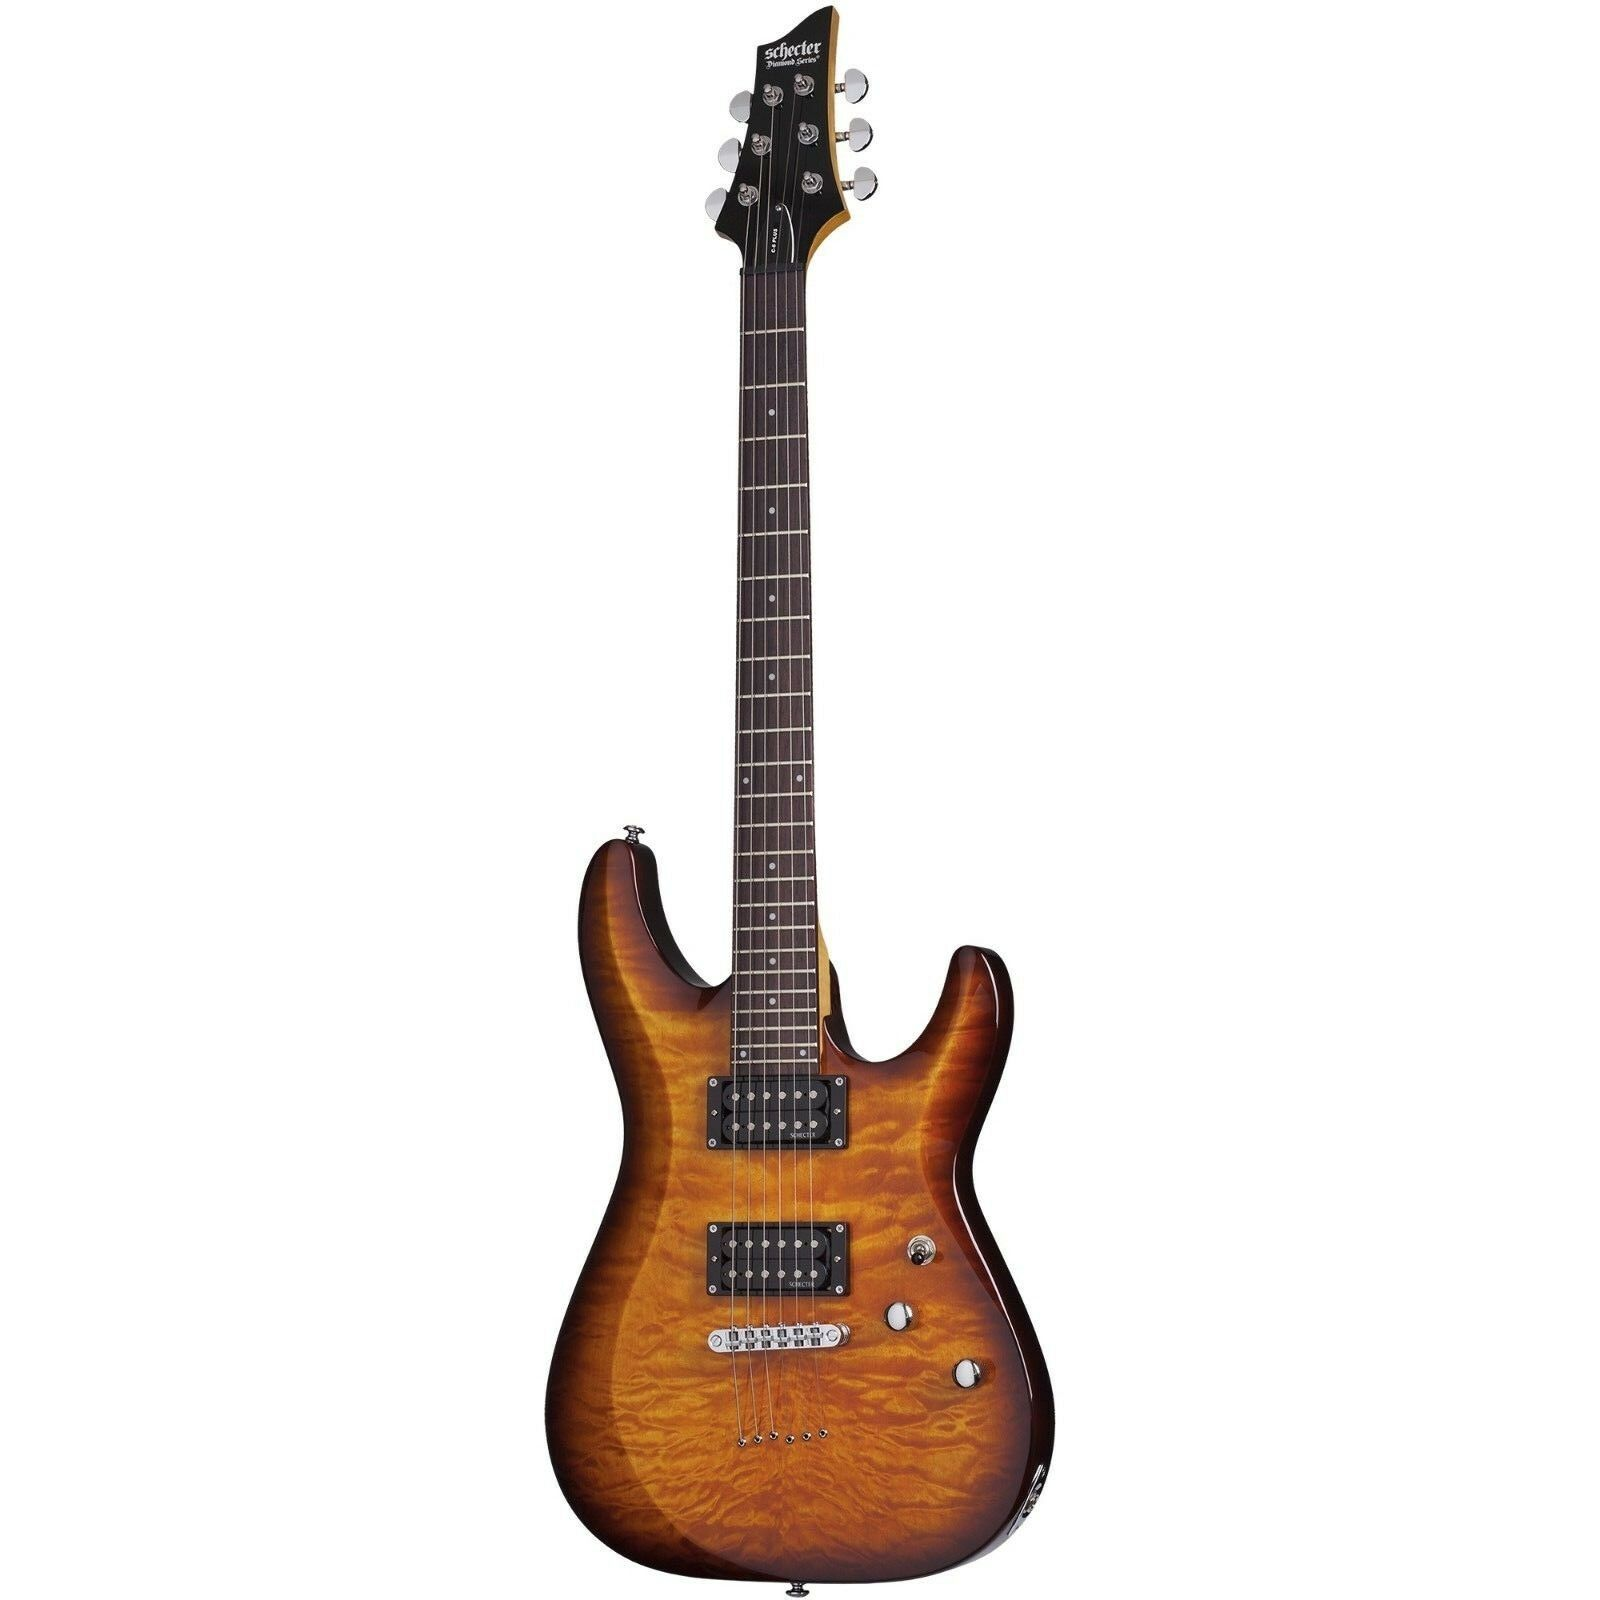 Schecter C-6 Plus Vintage Sunburst VSB B-Stock Electric Guitar C6 C 6